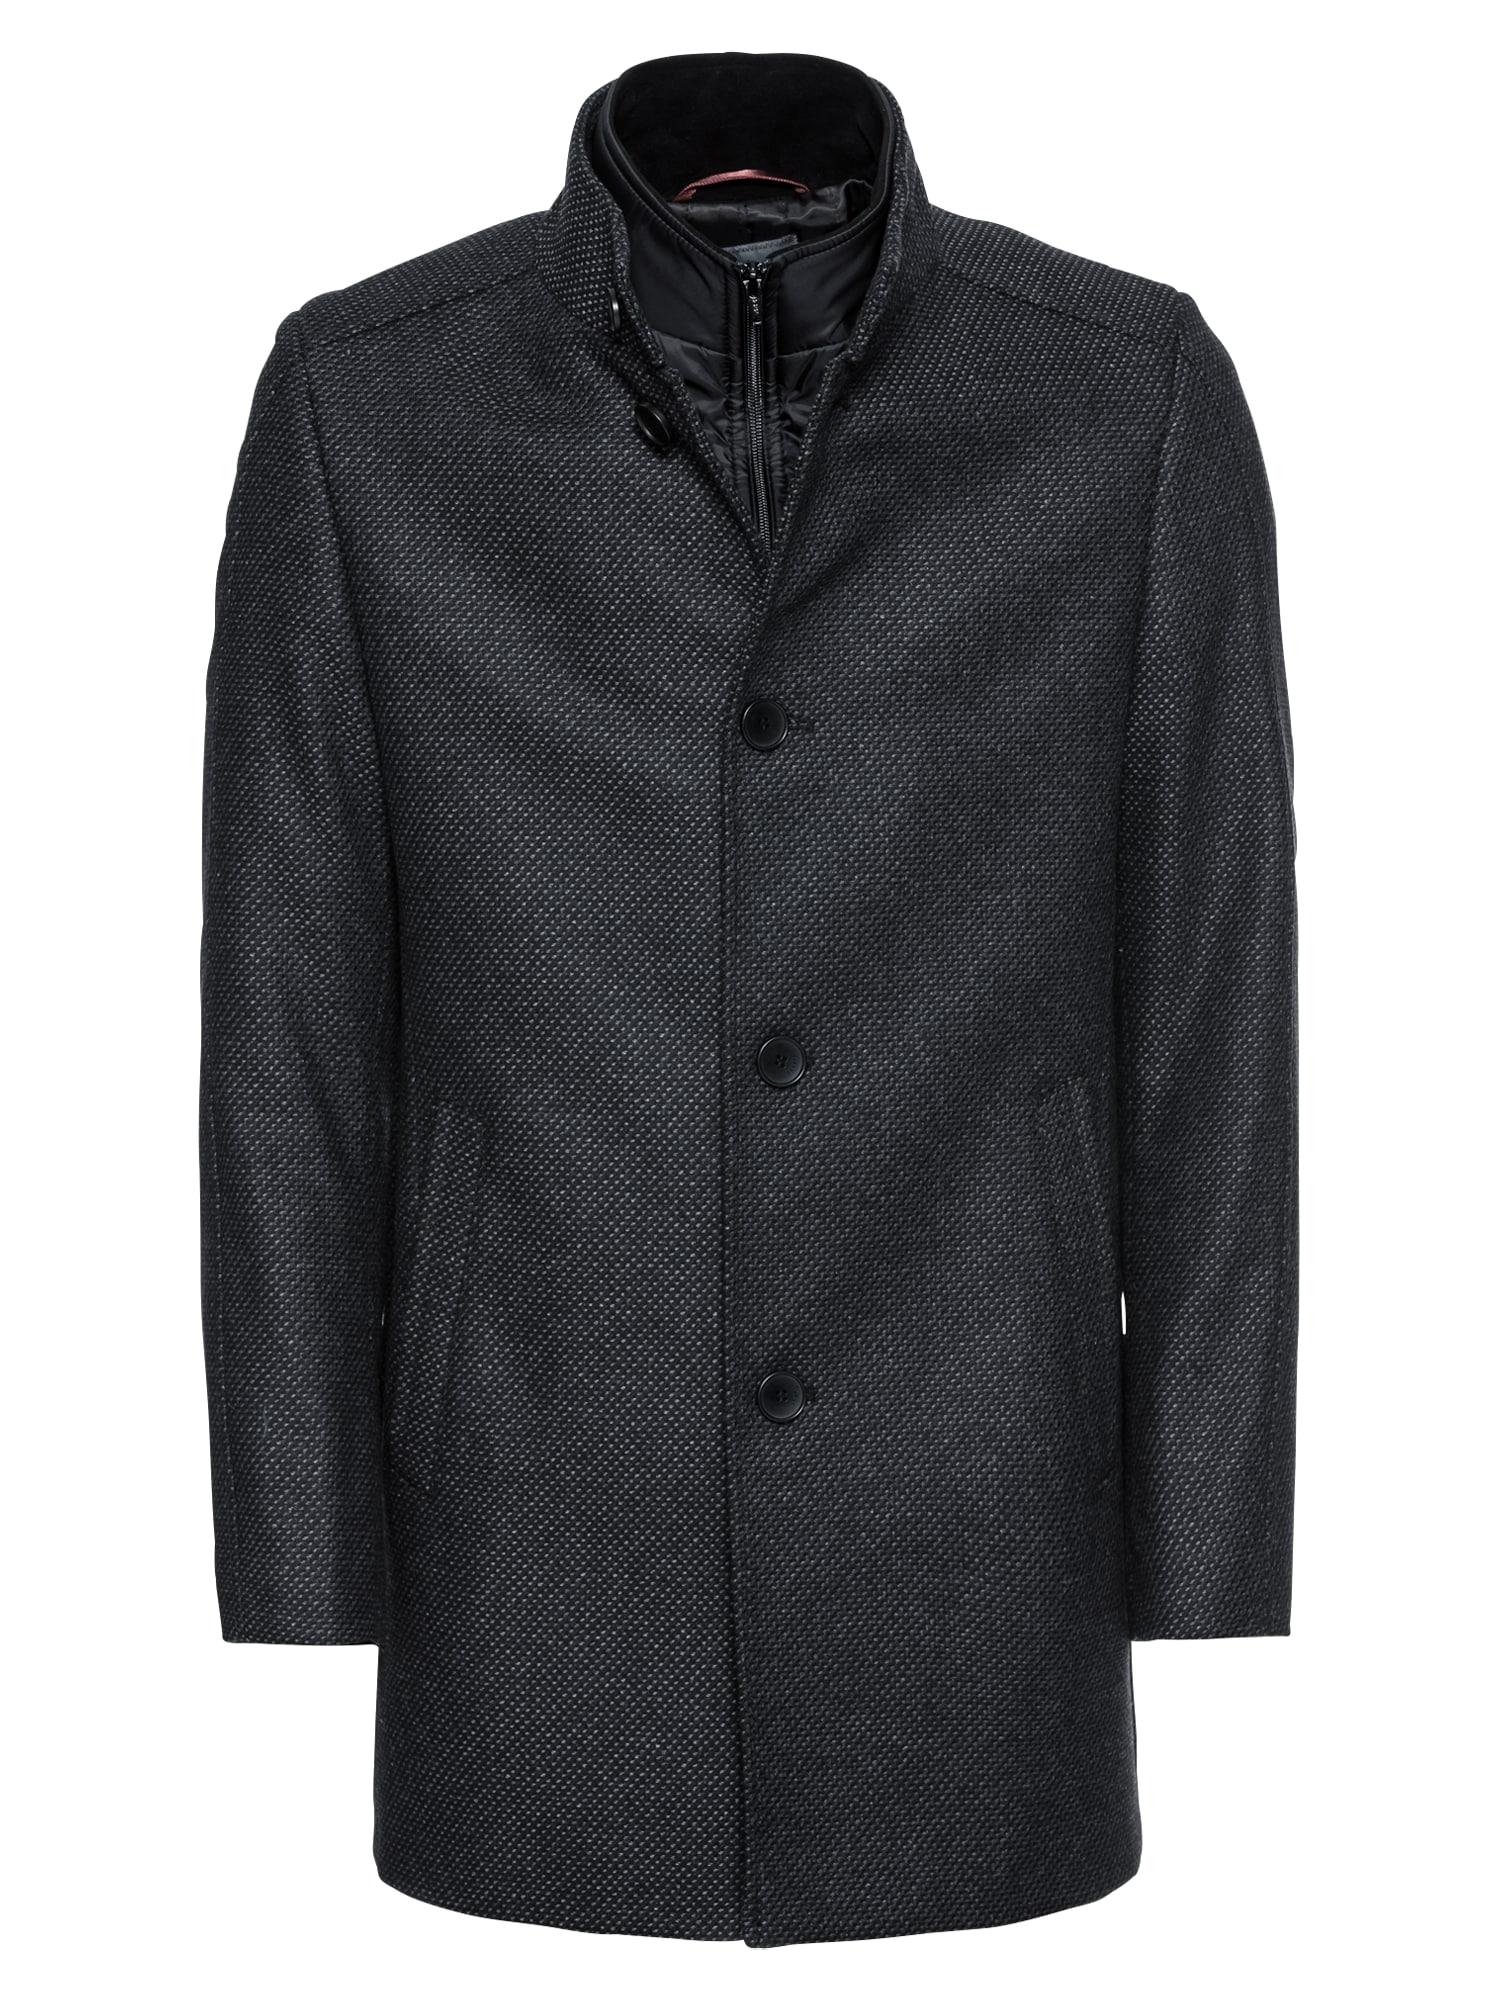 Zimní kabát CIOXFORD námořnická modř CINQUE